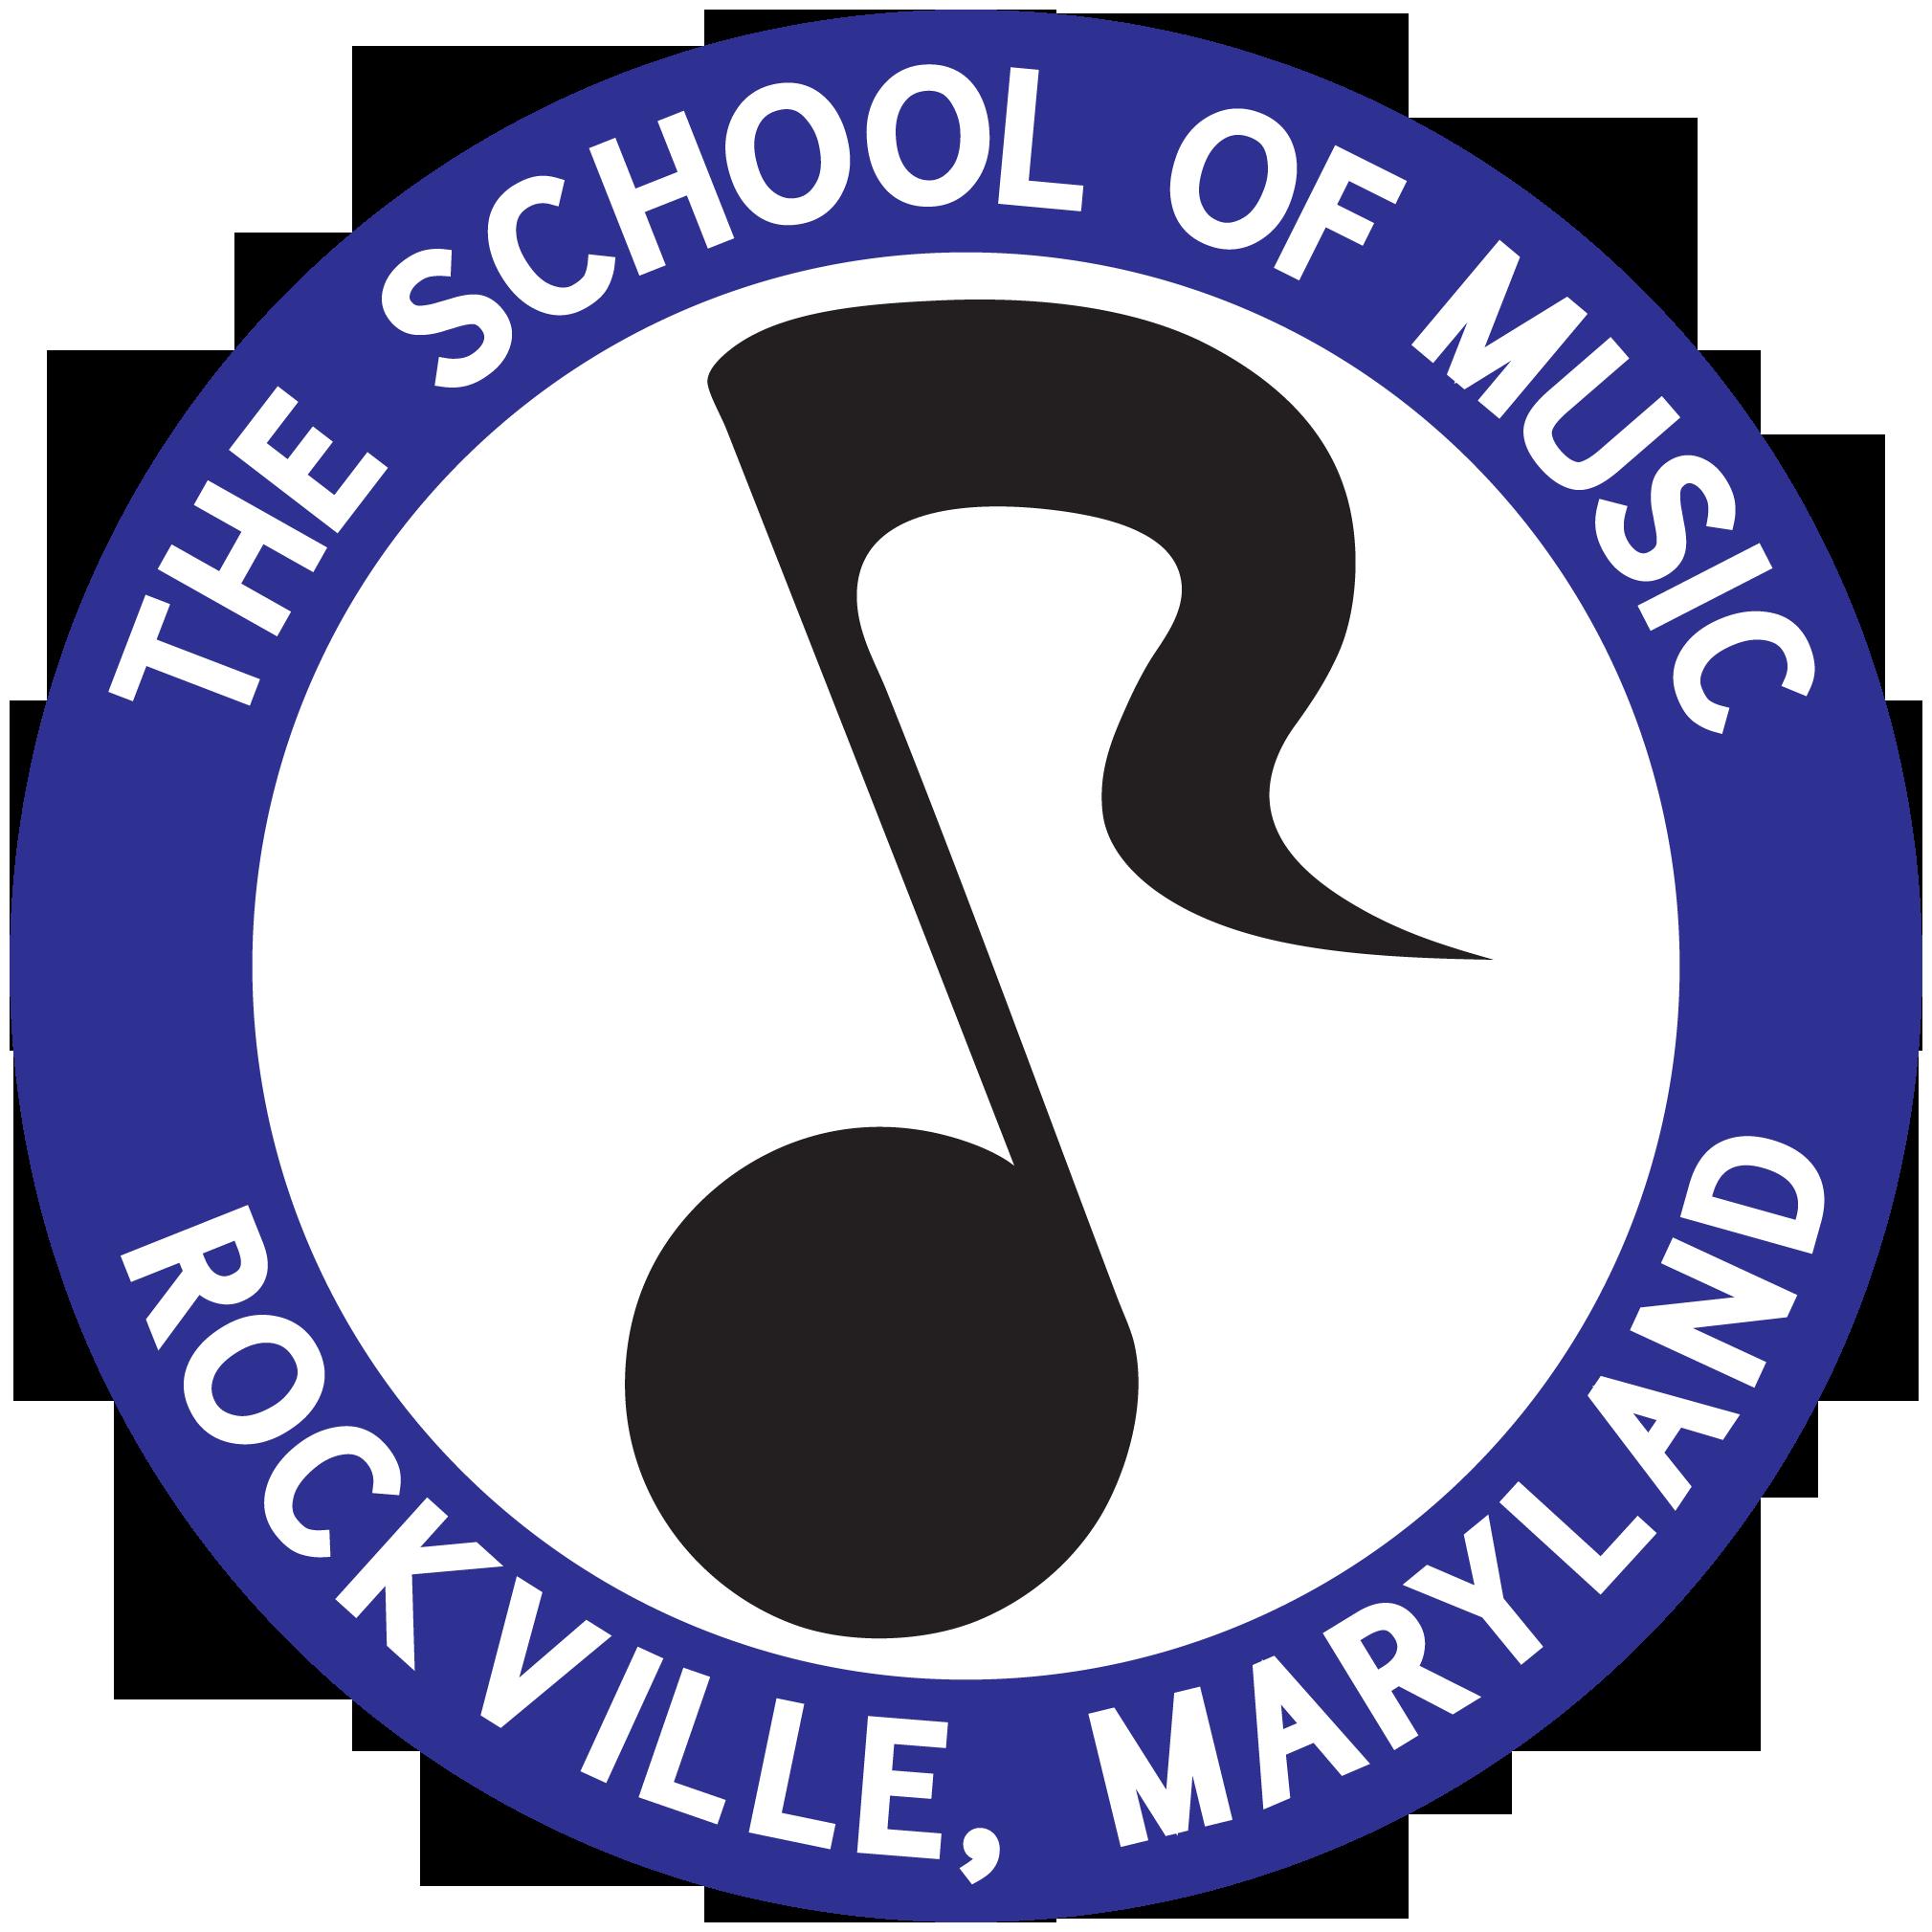 About us the school. Flutes clipart violin teacher